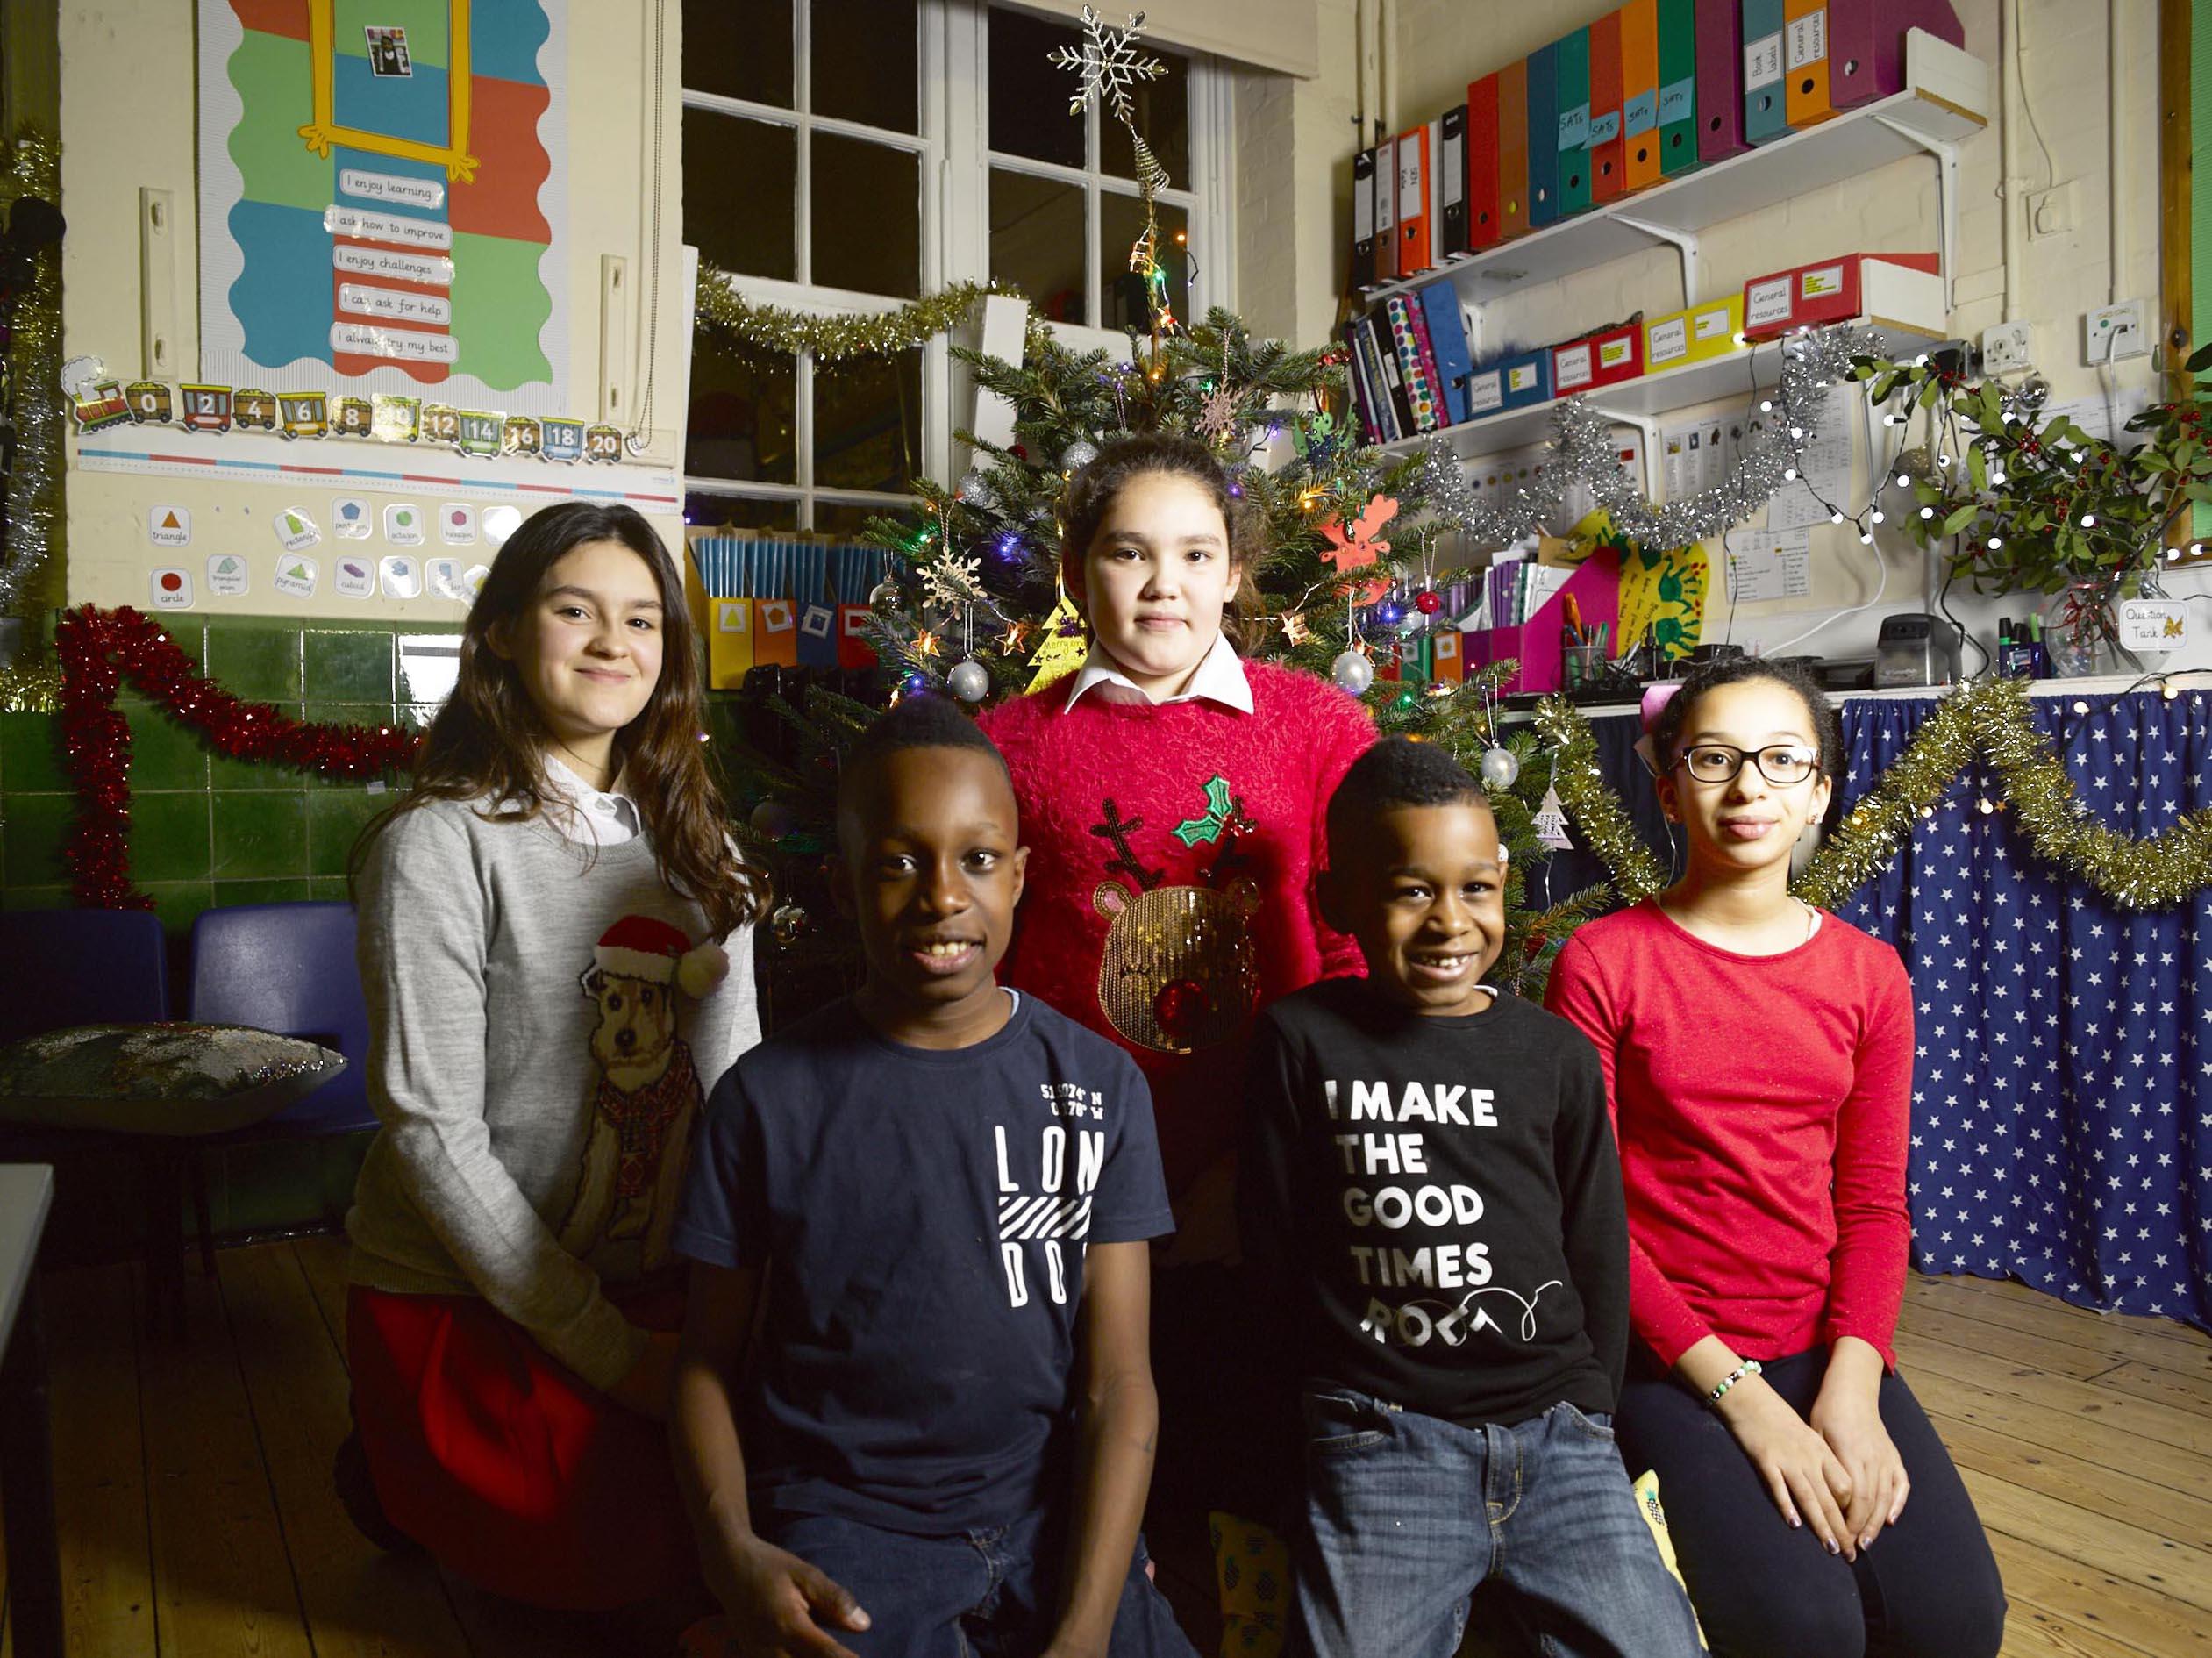 C4 Alternative Christmas Message speakers L- R Luana, Amiel, Megan, Danel and Hayam. C4 publicity still, BD